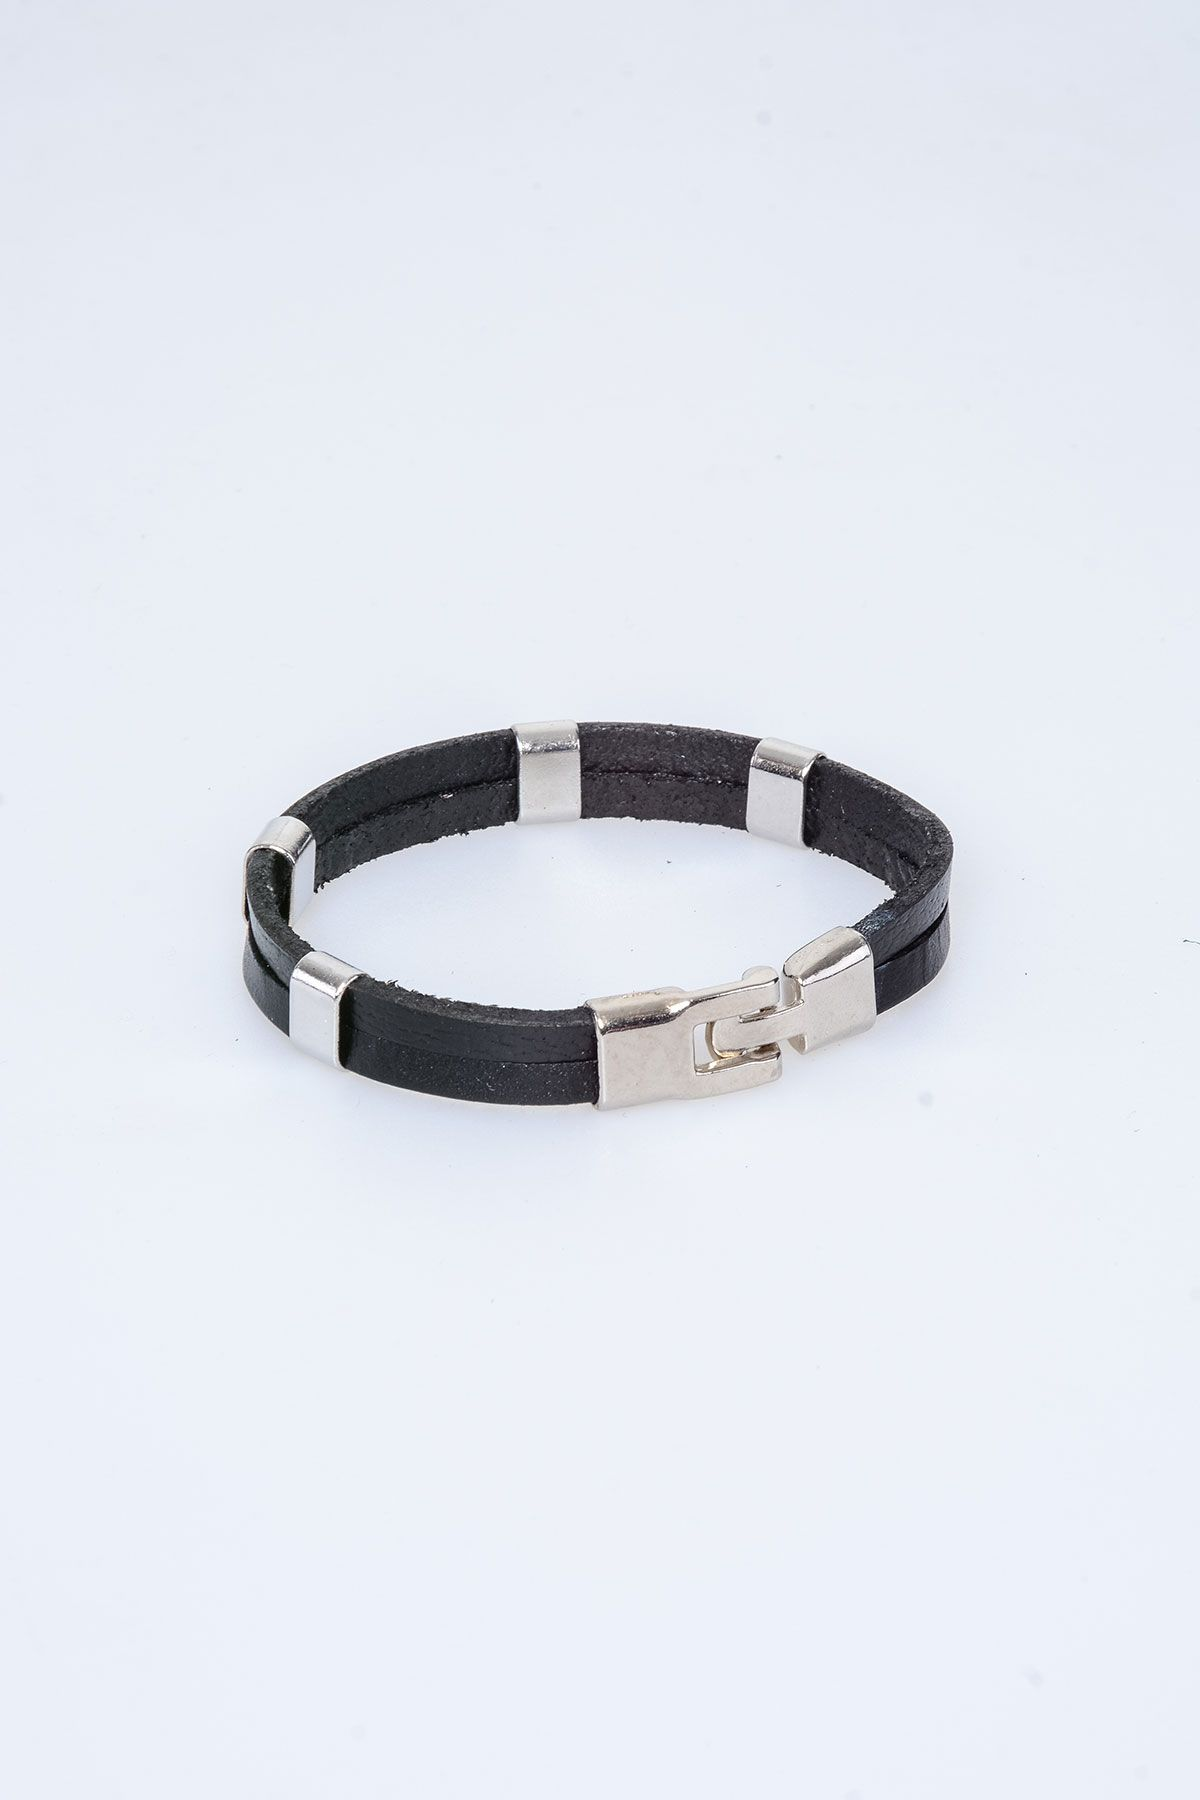 Pegia Genuine Leather Bracelet 19BL19 Black